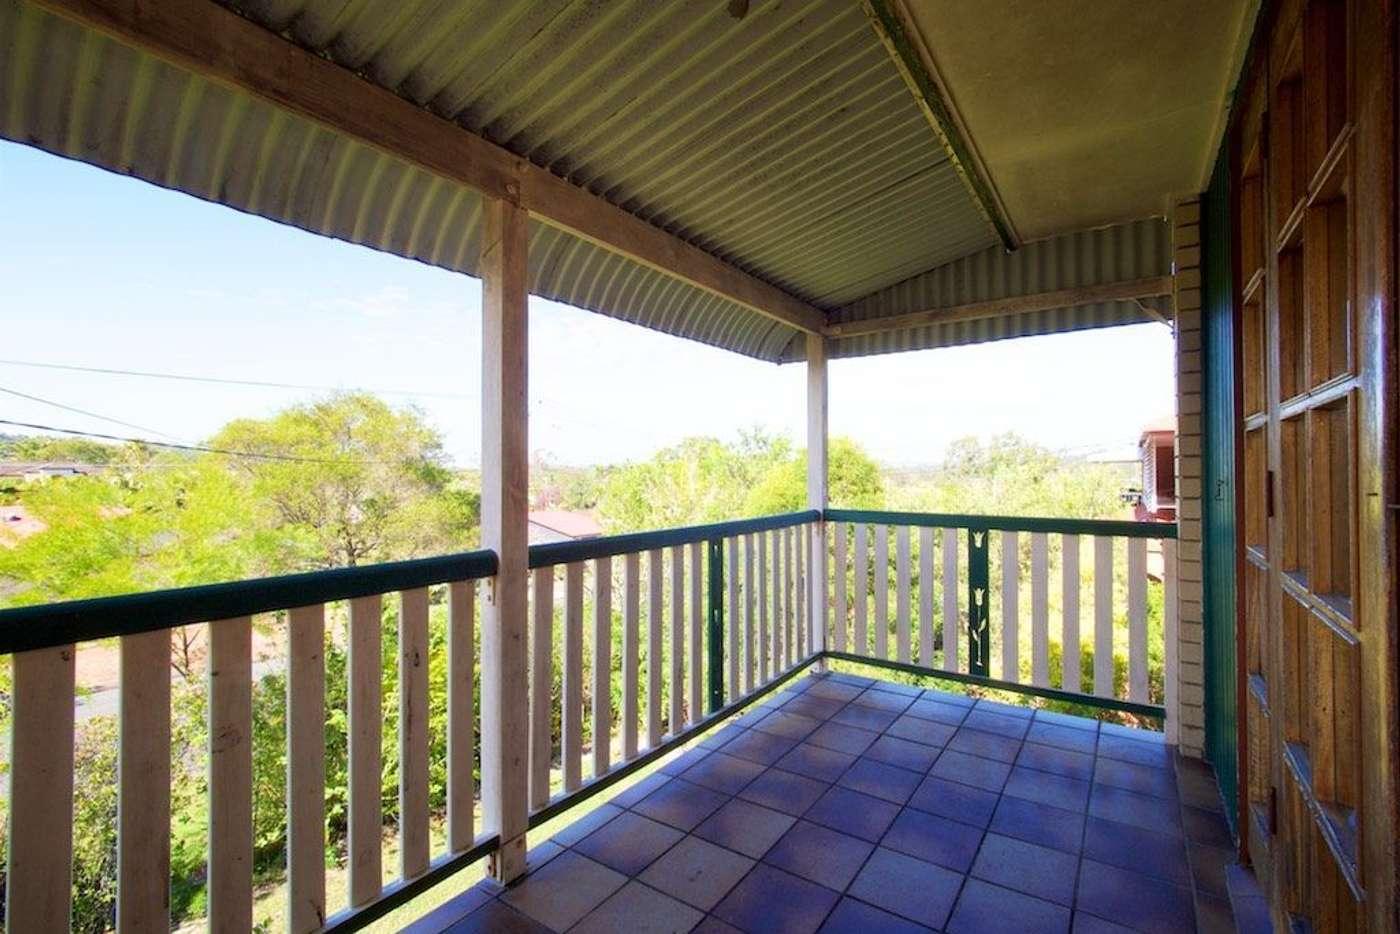 Seventh view of Homely house listing, 22 Meribah Street, Shailer Park QLD 4128